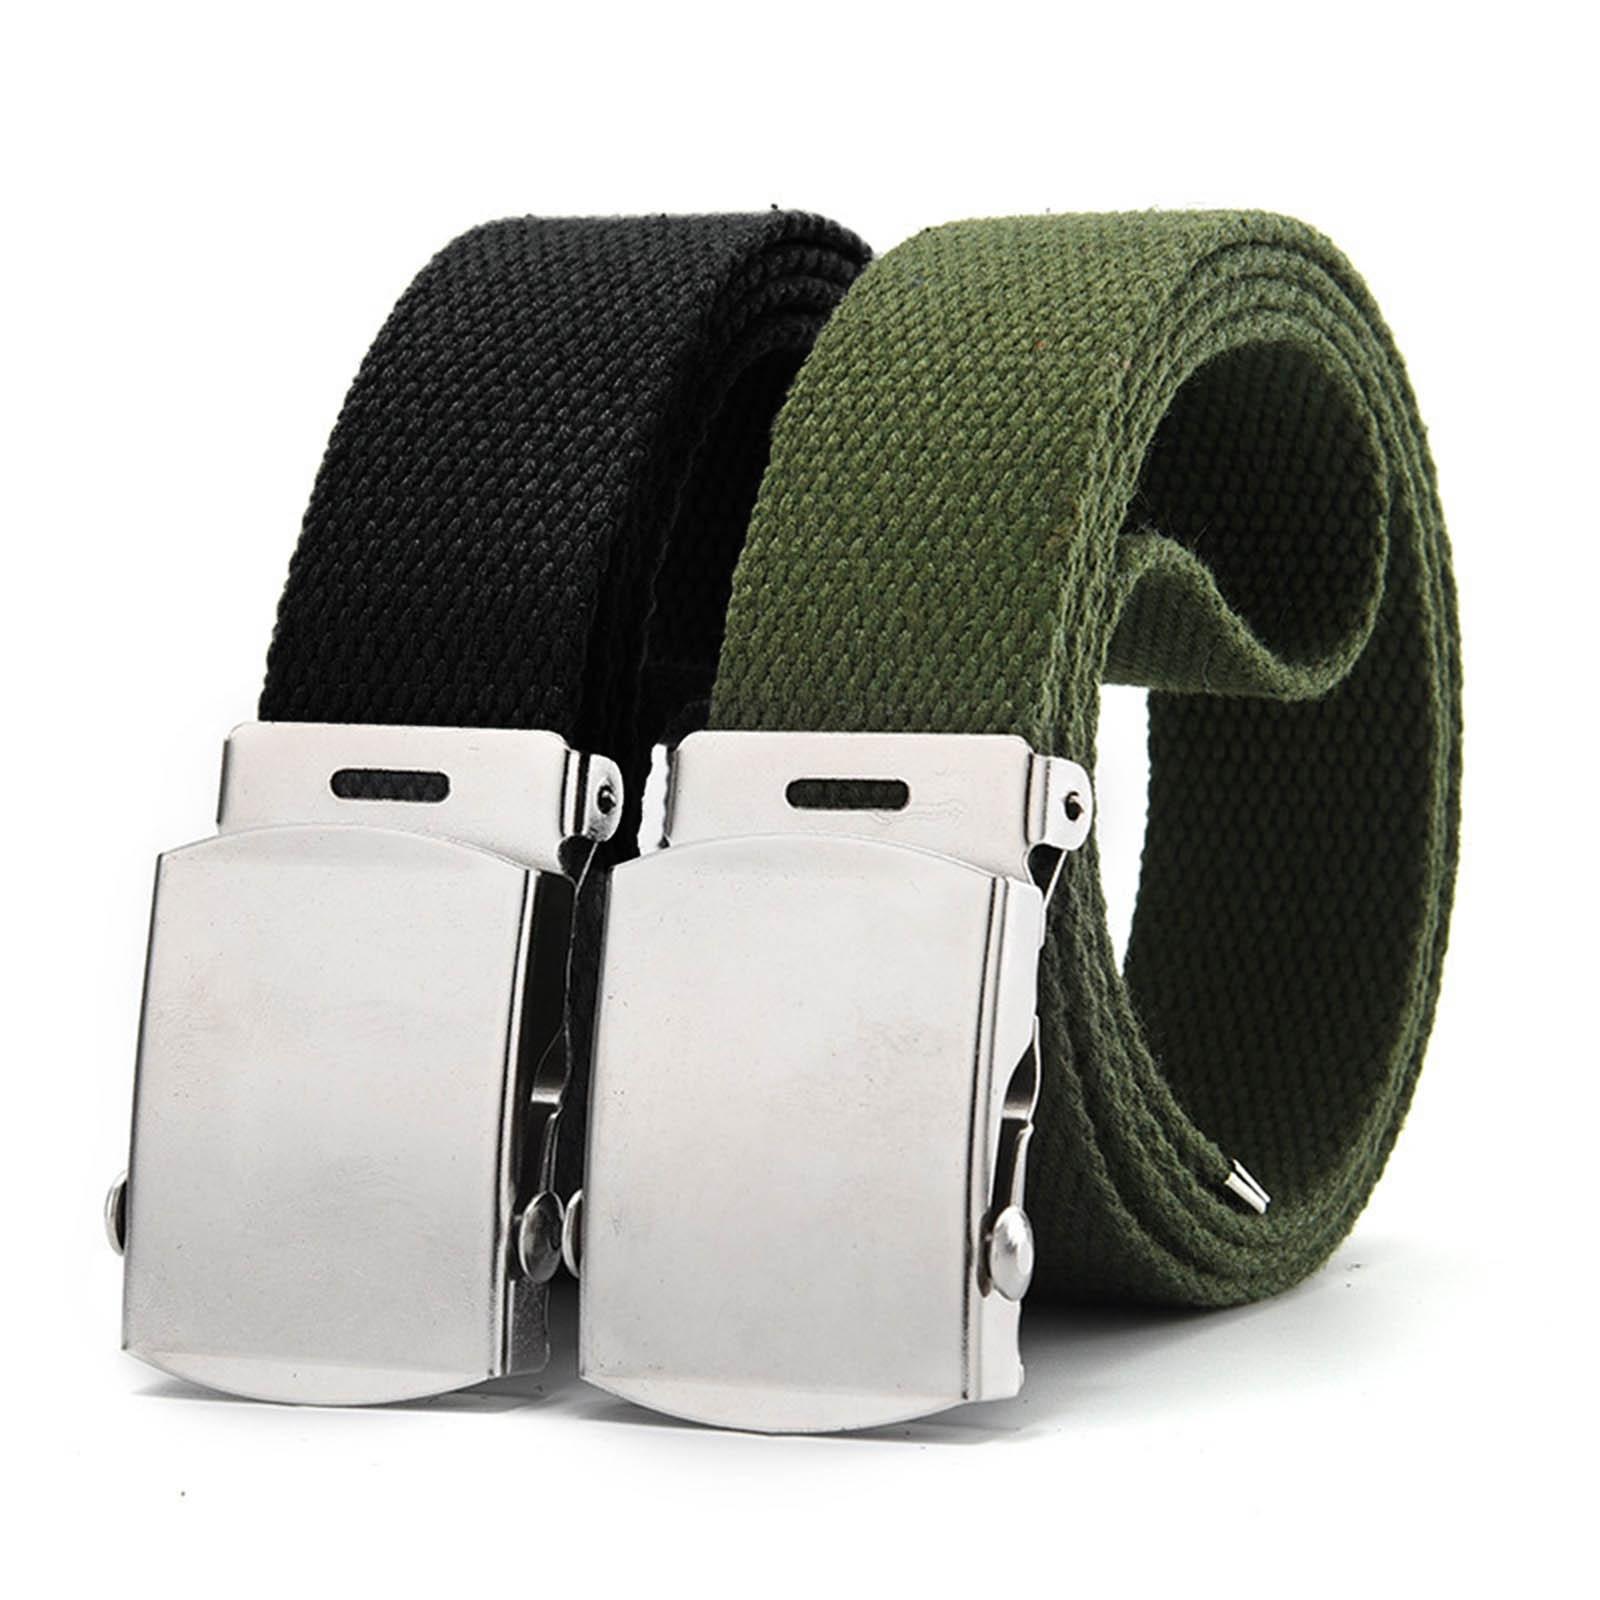 AliExpress - 2021 New Canvas Military Web Belt Metal Roller Buckle Mens Womens Causal Cloth Decor Jeans Accessories Ремень Женский